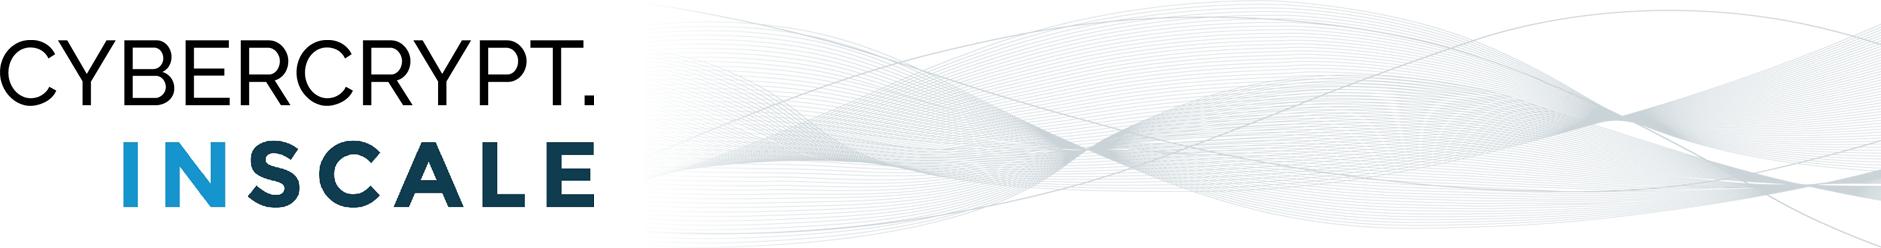 cybercrypt - wavy lines - 1